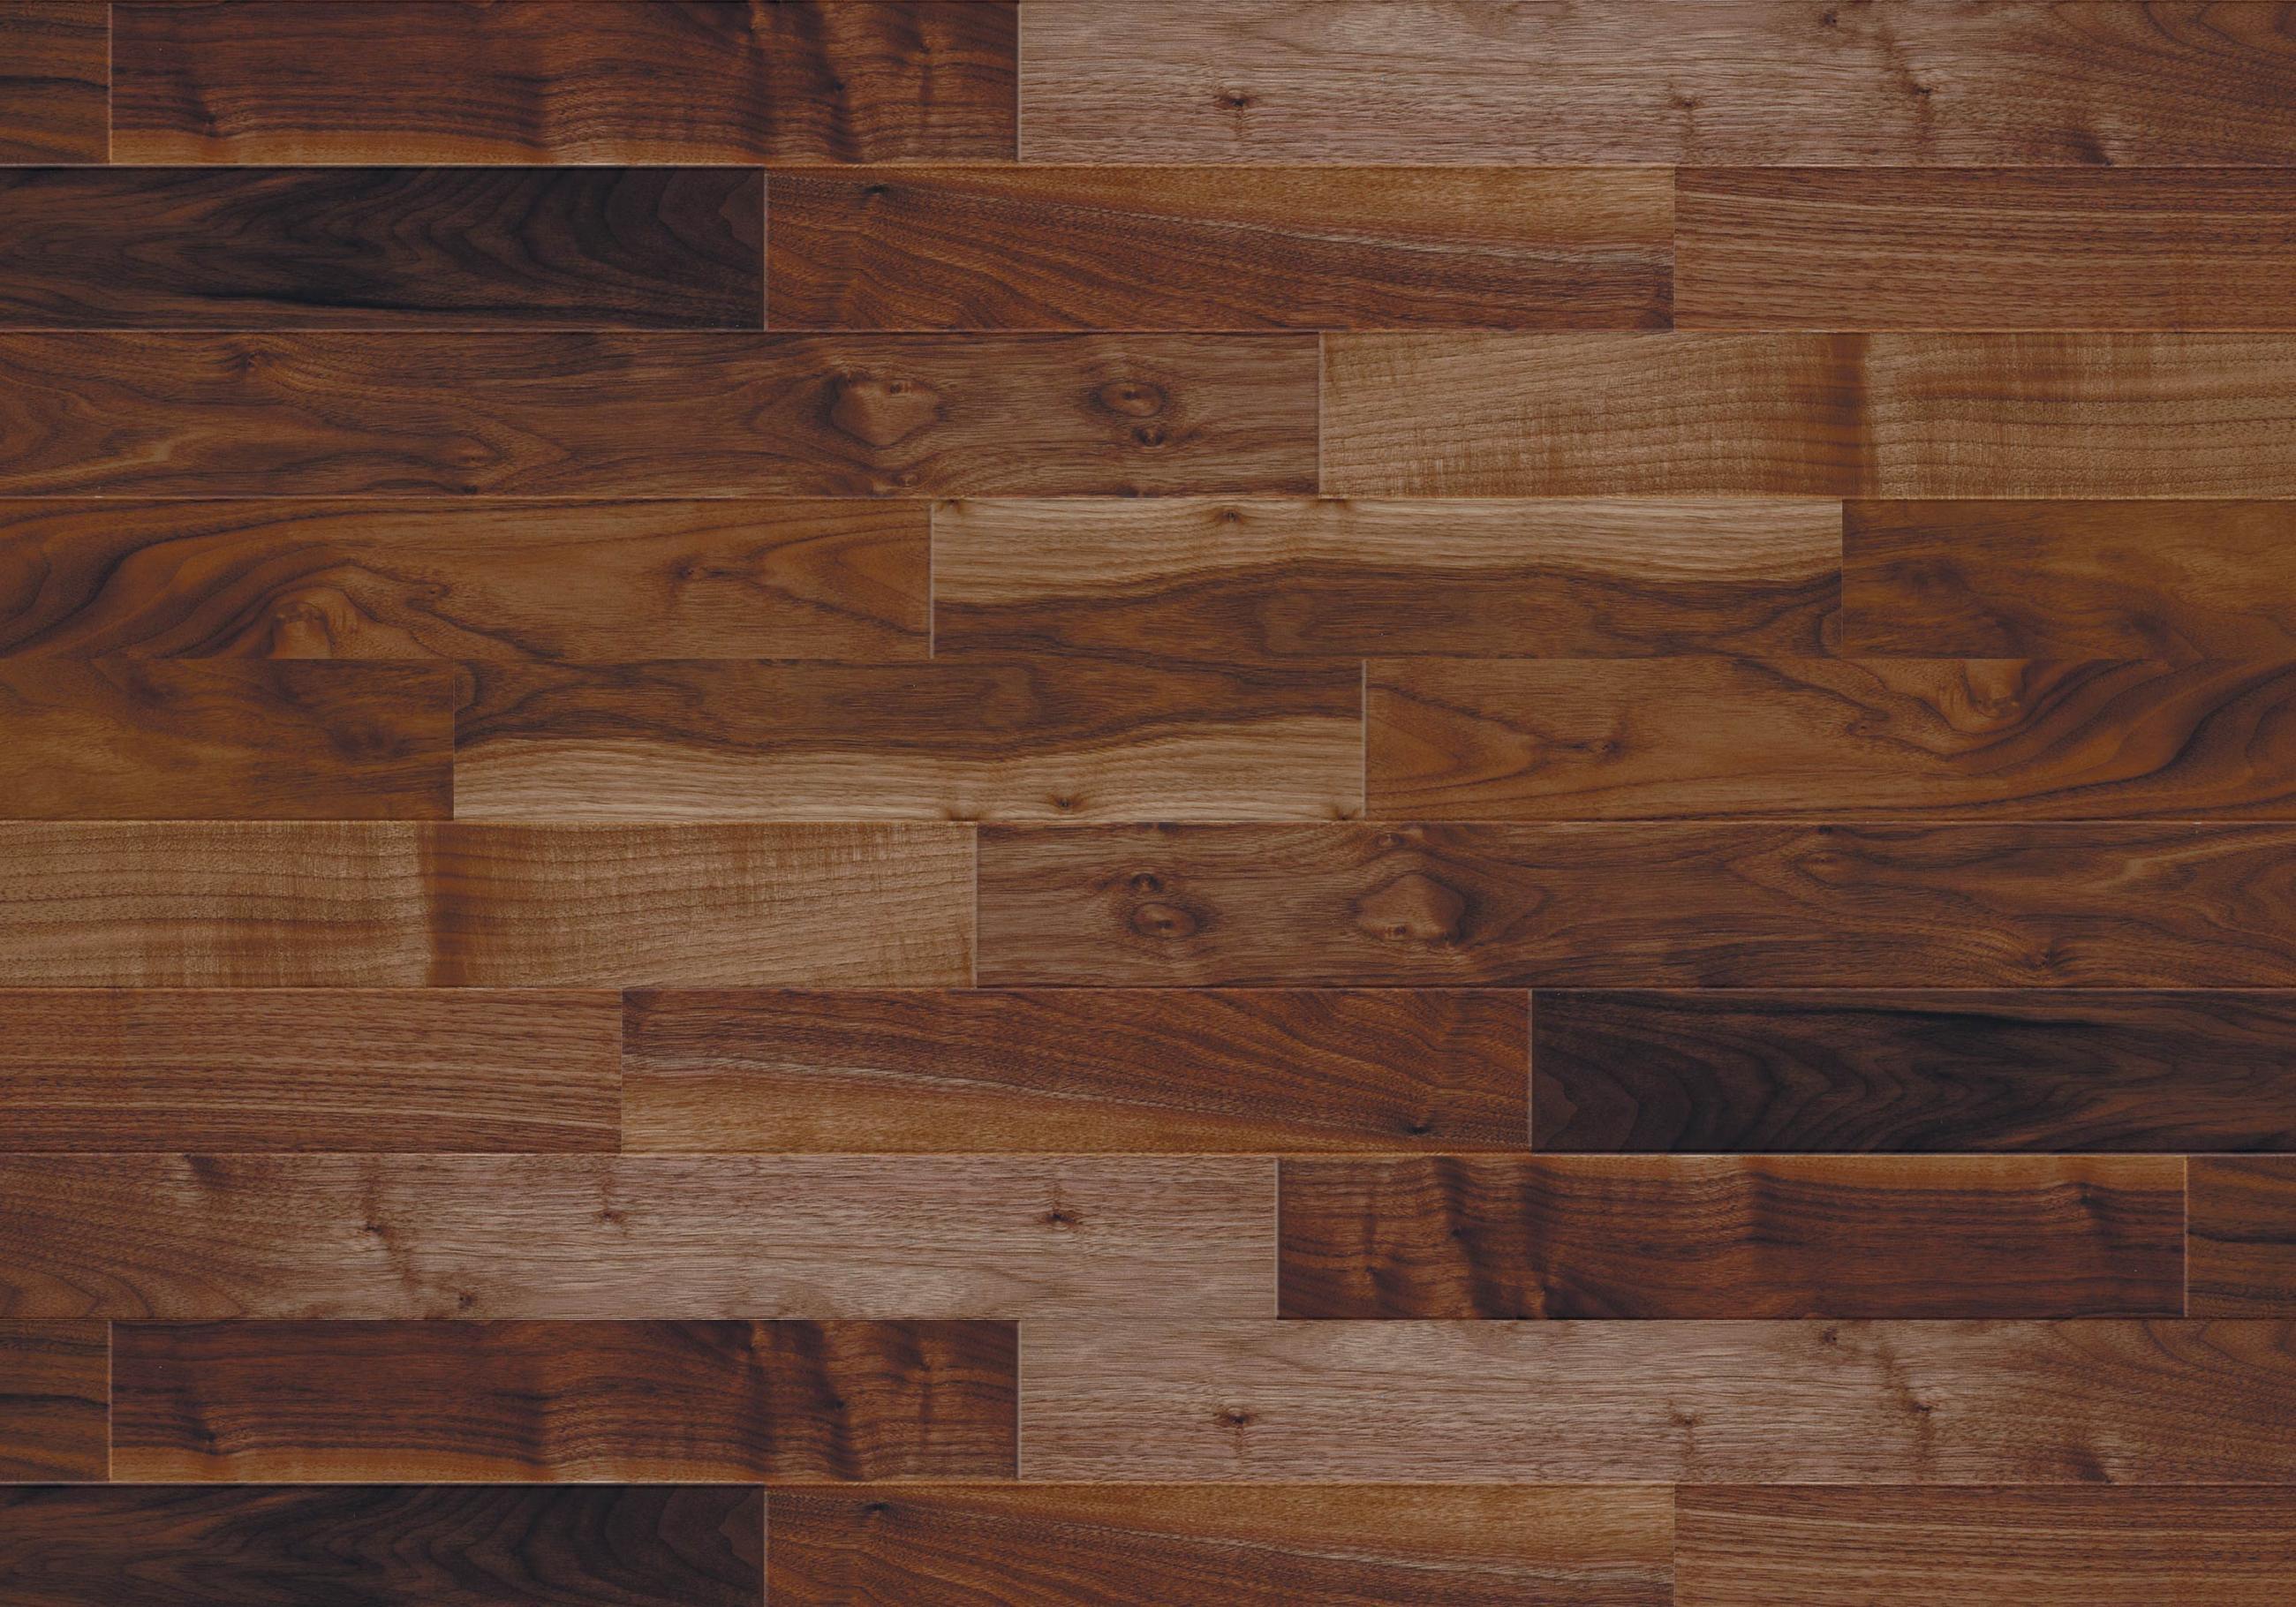 hardwood flooring sale toronto of breathtaking hardwood flooring pictures beautiful floors are here only with breathtaking hardwood flooring picture ottawa floor continental read more cost near me toronto lowe home depot